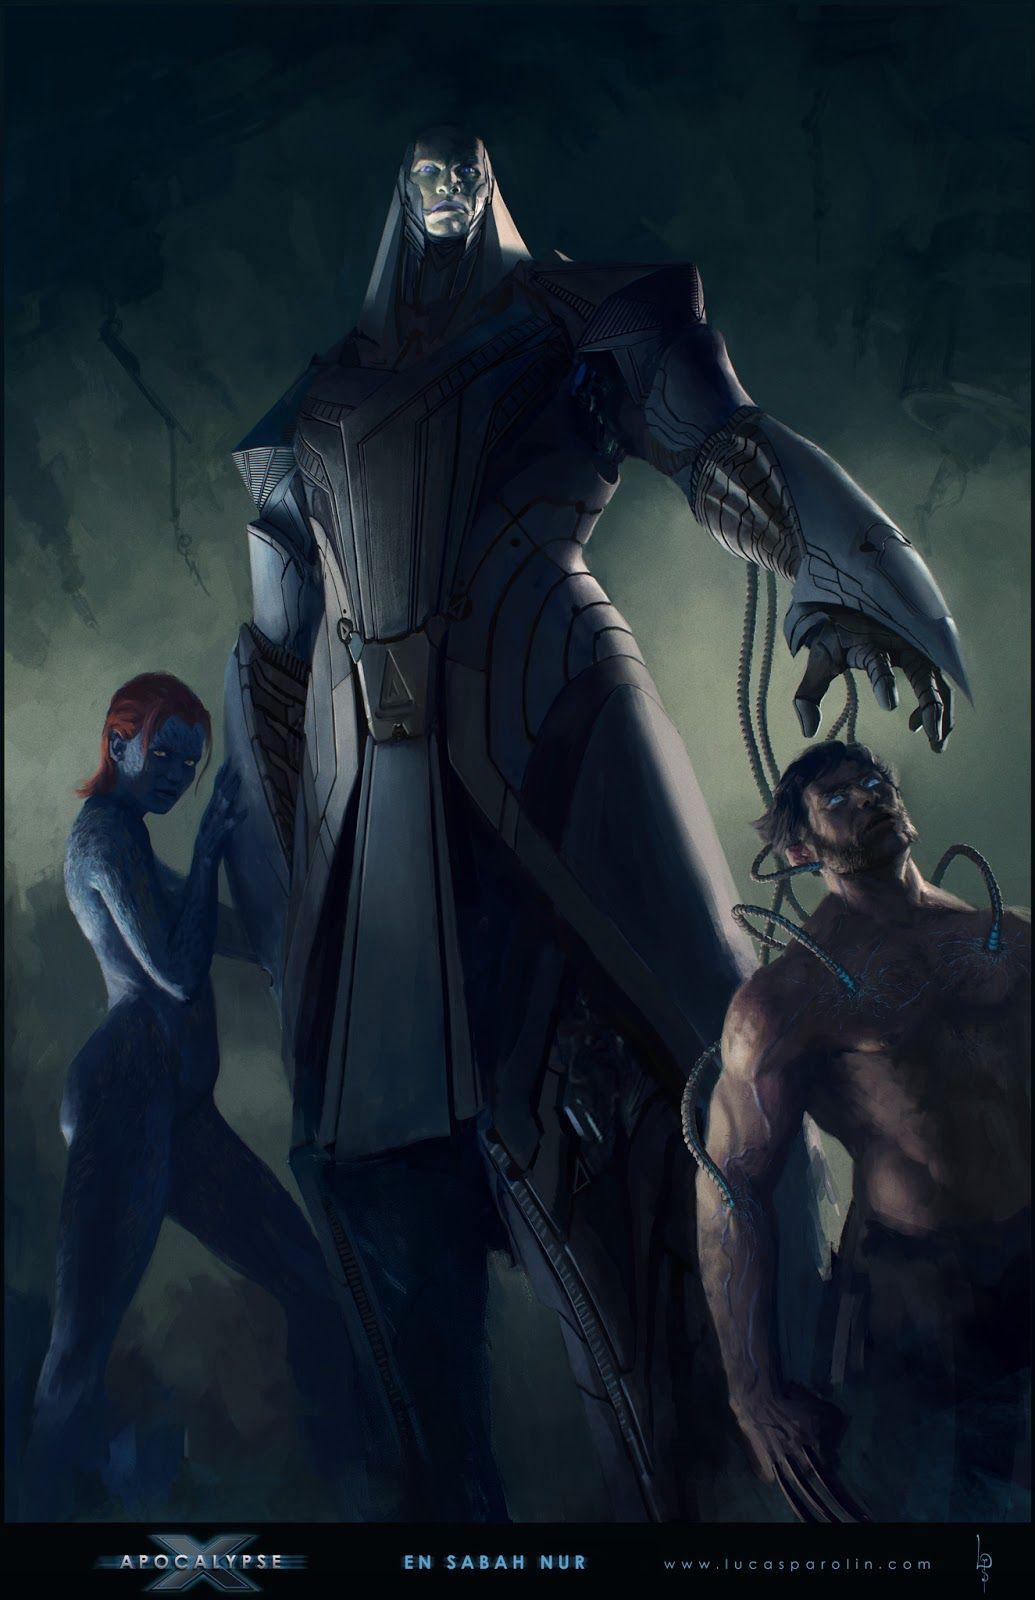 X-Men: Apocalypse Photos Offer Better Look at Archangel ... Apocalypse